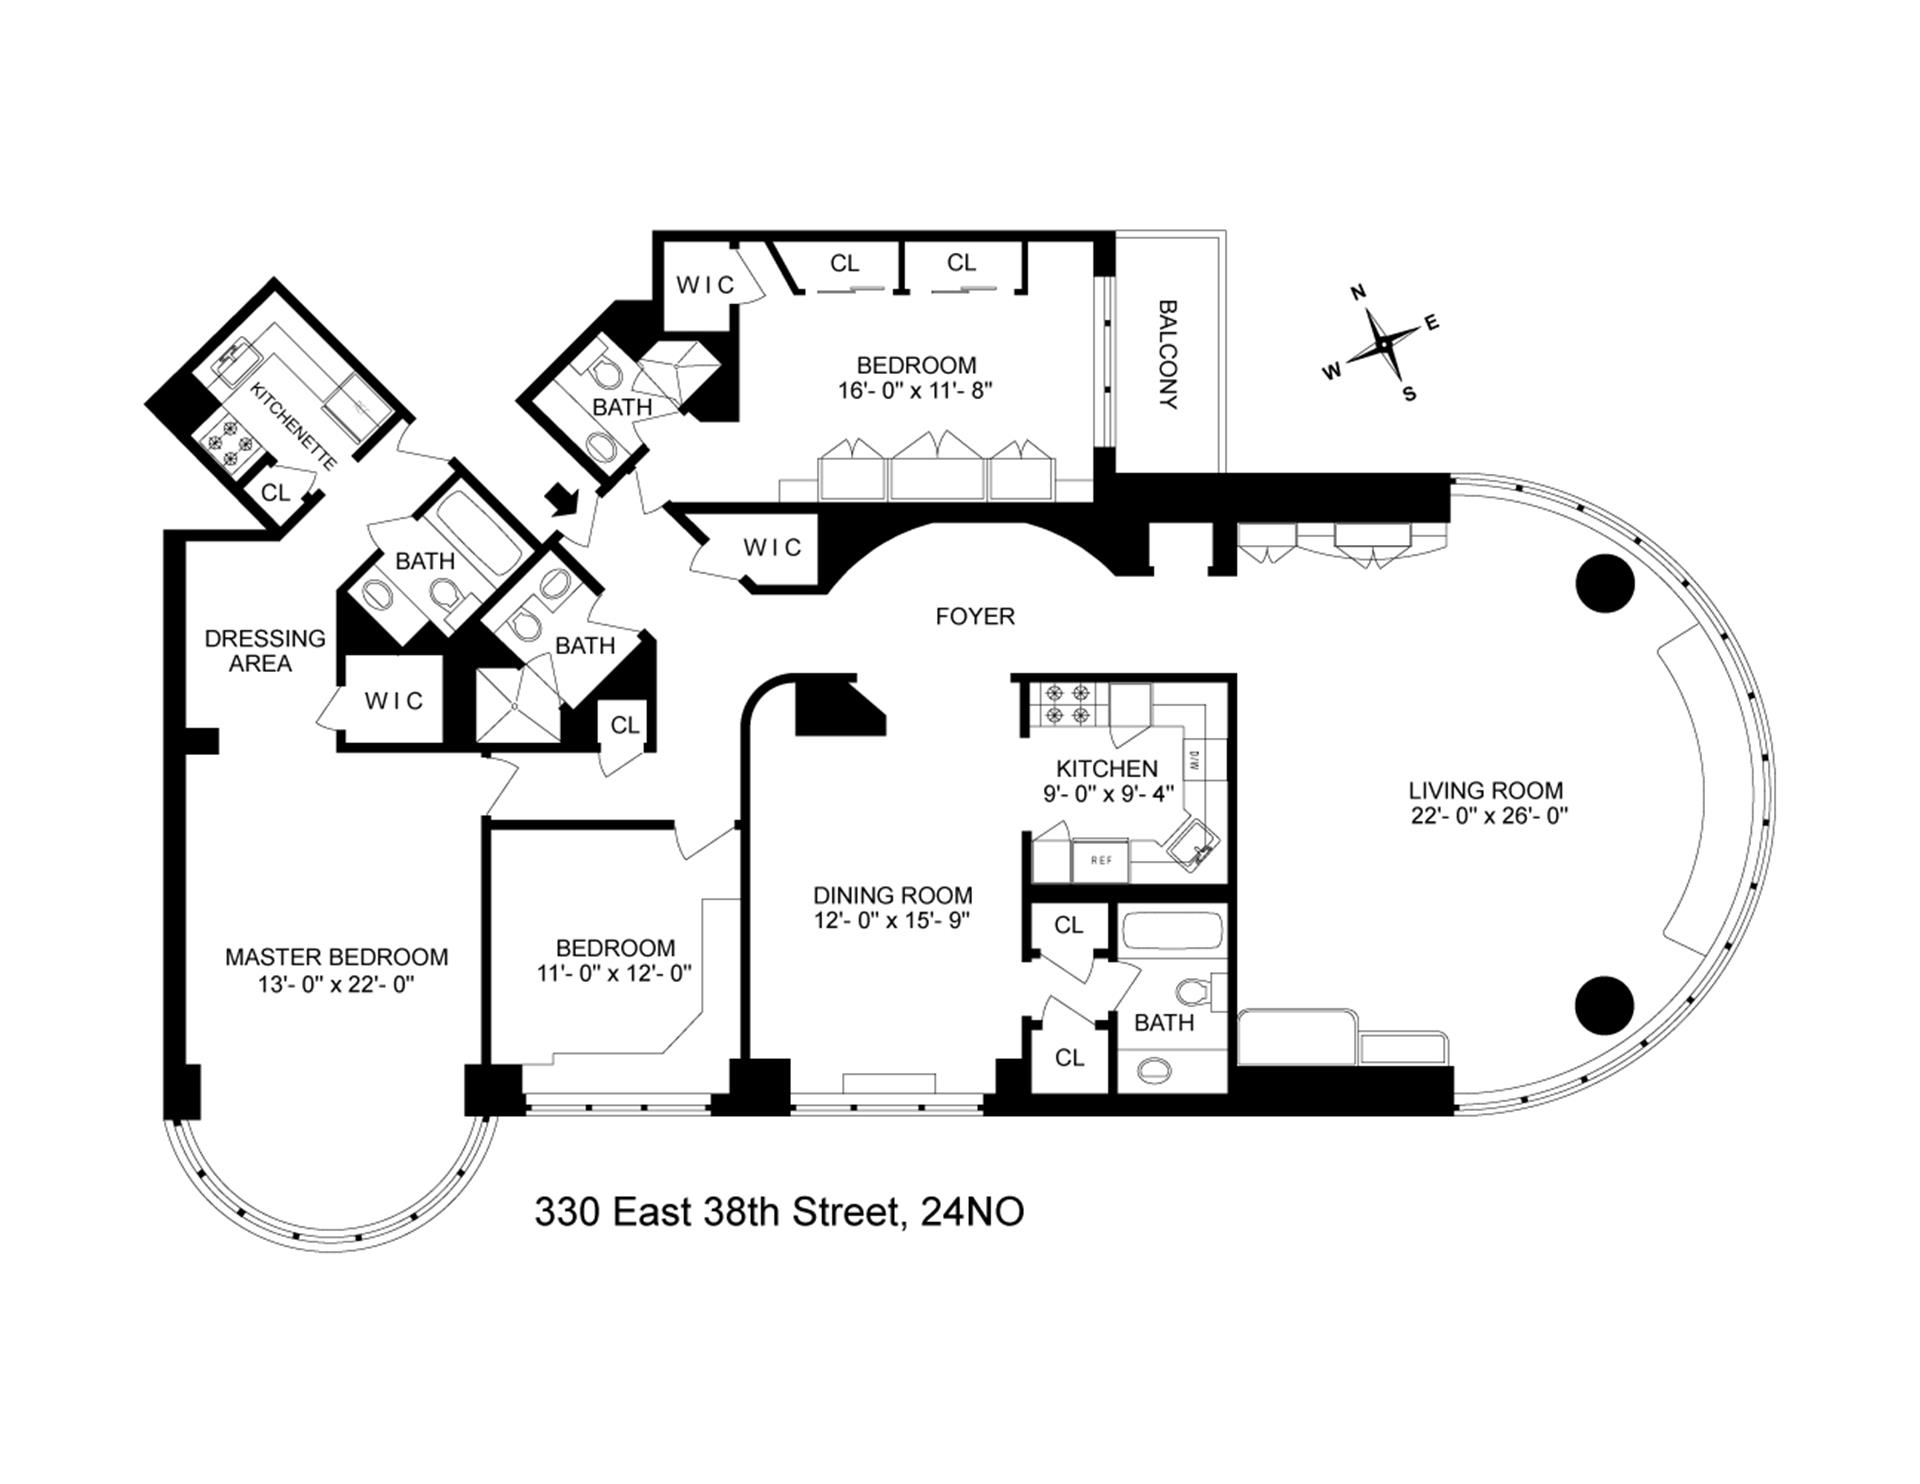 Floor plan of 330 East 38th Street, 24NO - Murray Hill, New York